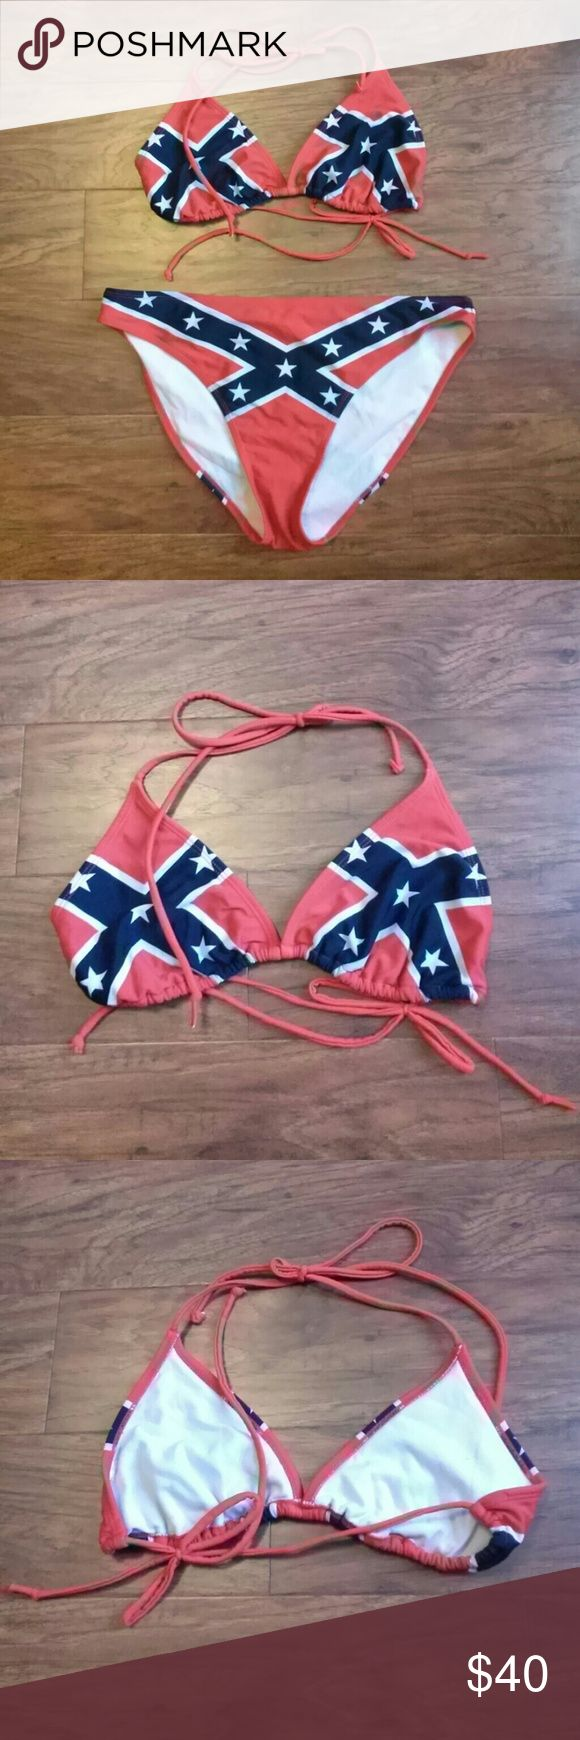 Selling this Rebel Flag Bikini on Poshmark! My username is: kristenlynnb. #shopmycloset #poshmark #fashion #shopping #style #forsale #Other